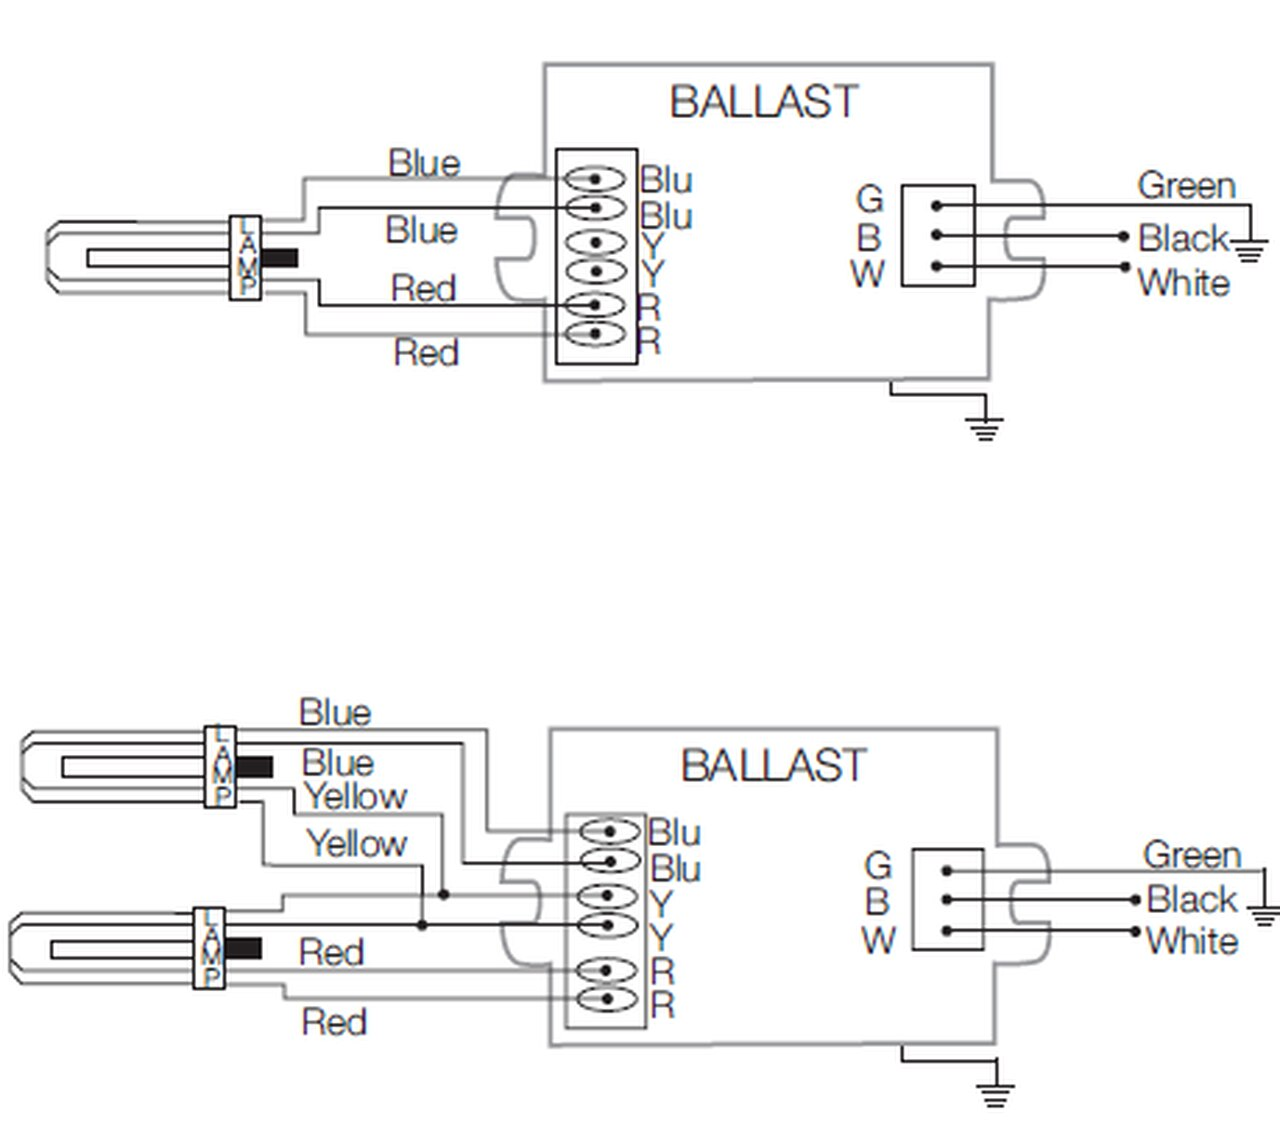 Sylvania Wiring Diagrams Ballast